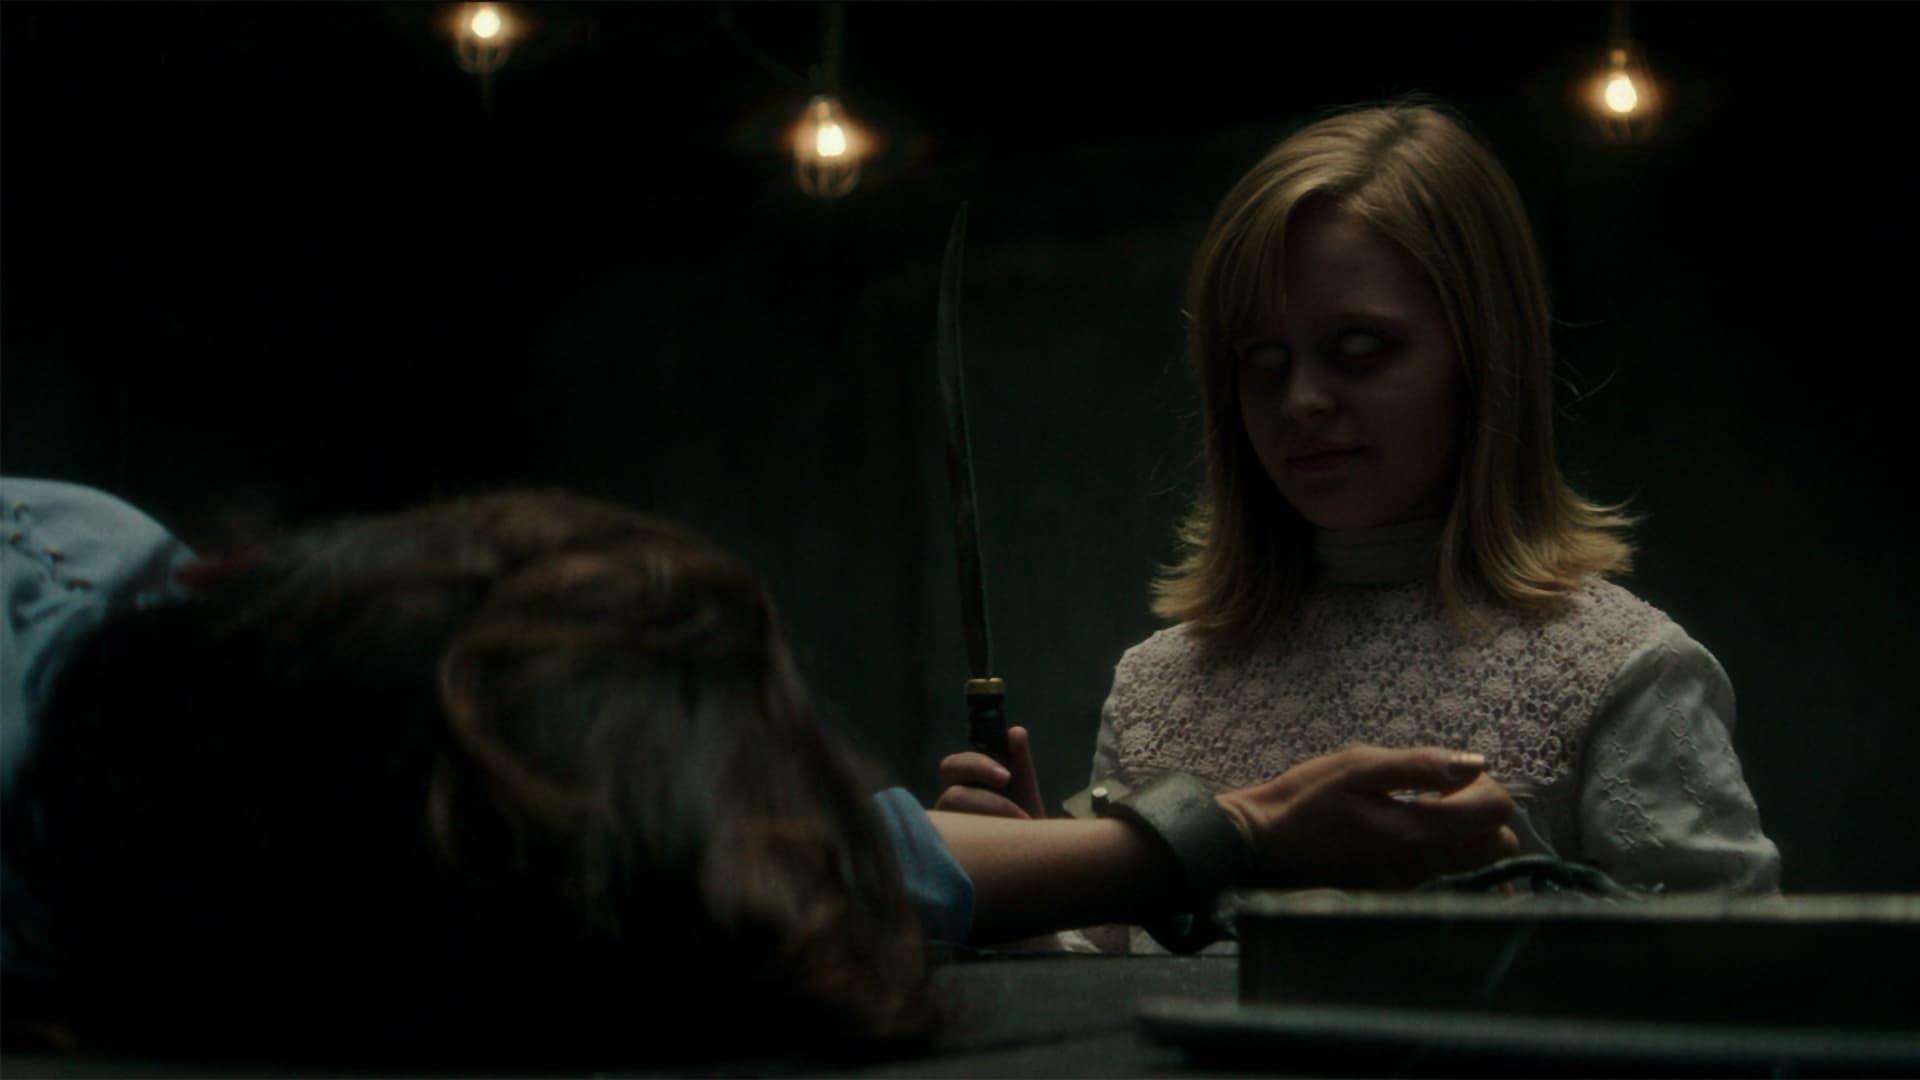 Watch Full Ouija: Origin of Evil 2016 Movie